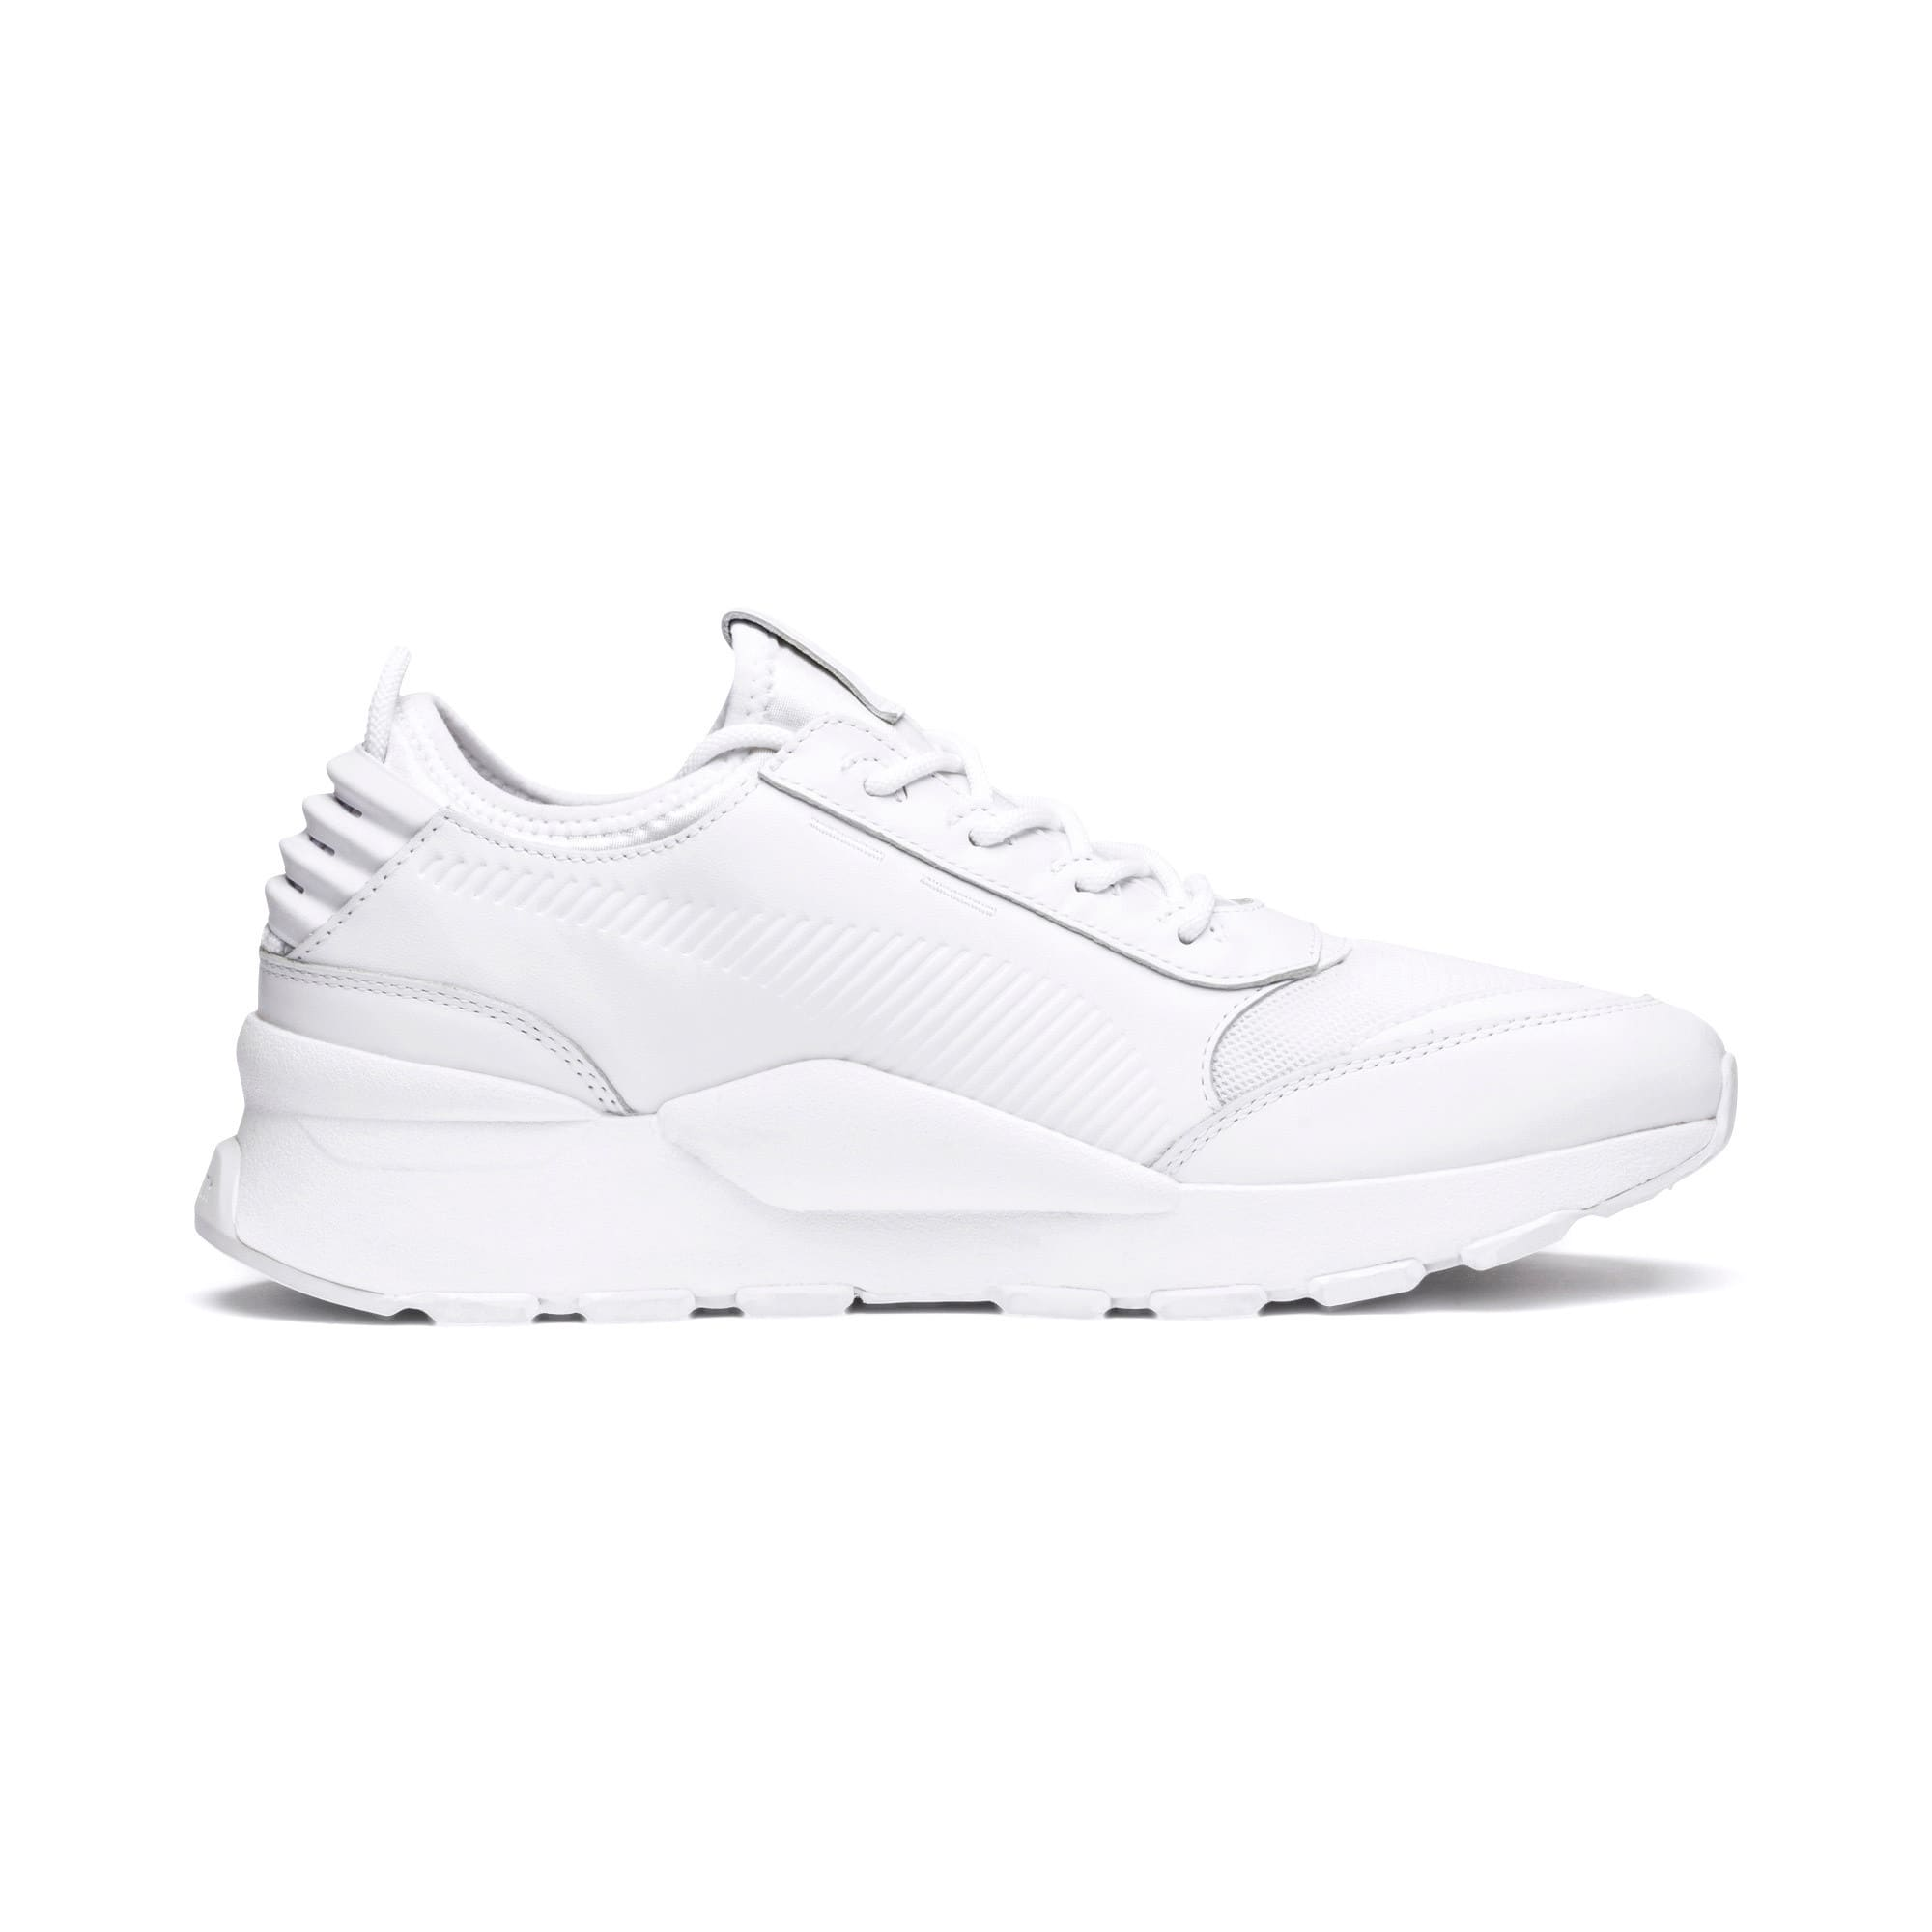 Thumbnail 5 of Evolution RS-0 SOUND sneakers, Puma White, medium